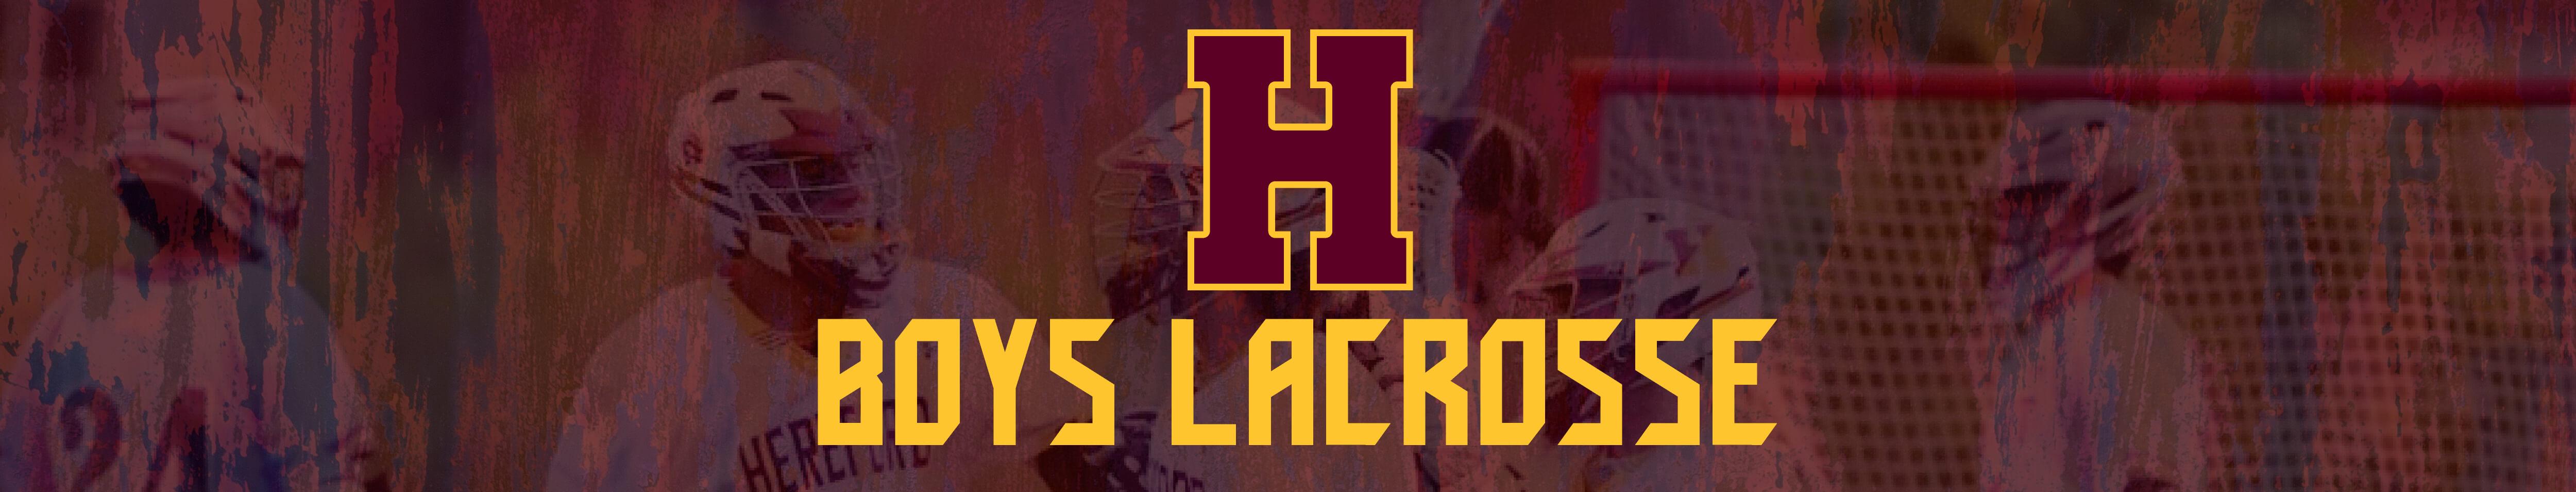 Hereford HS Boys Lacrosse